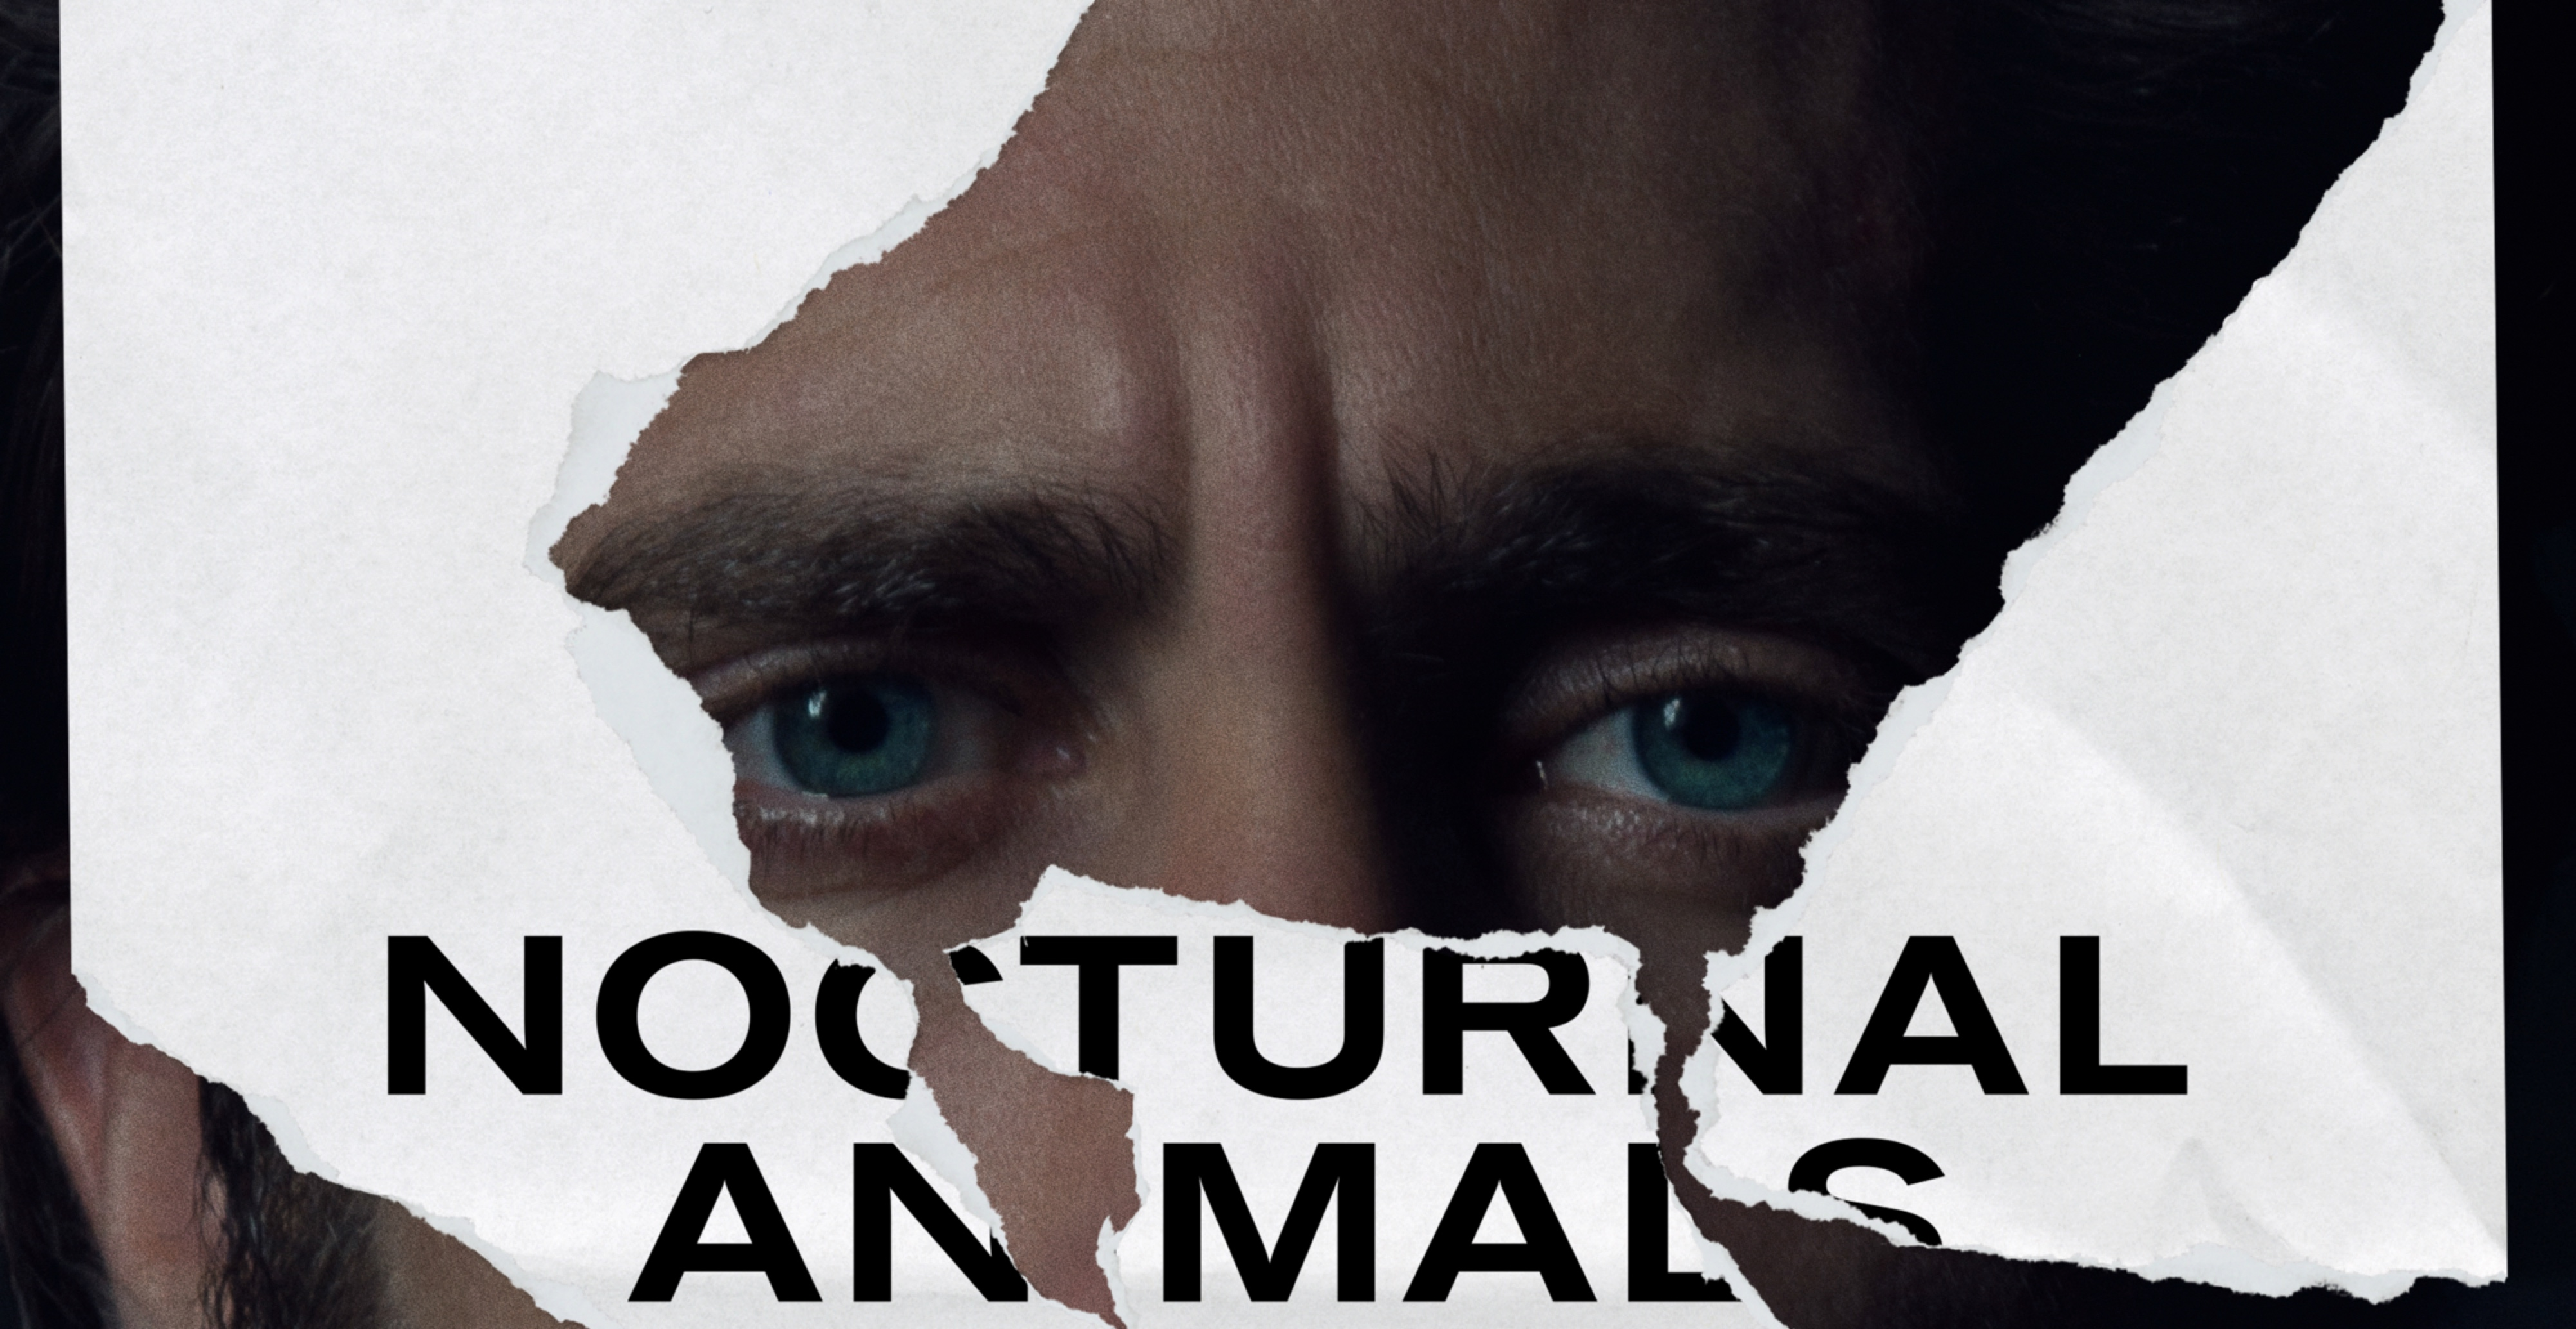 Download Nocturnal Animals (2016) 1080p BRRip Dual Audios [ HIN, ENG ] Eng Torrent